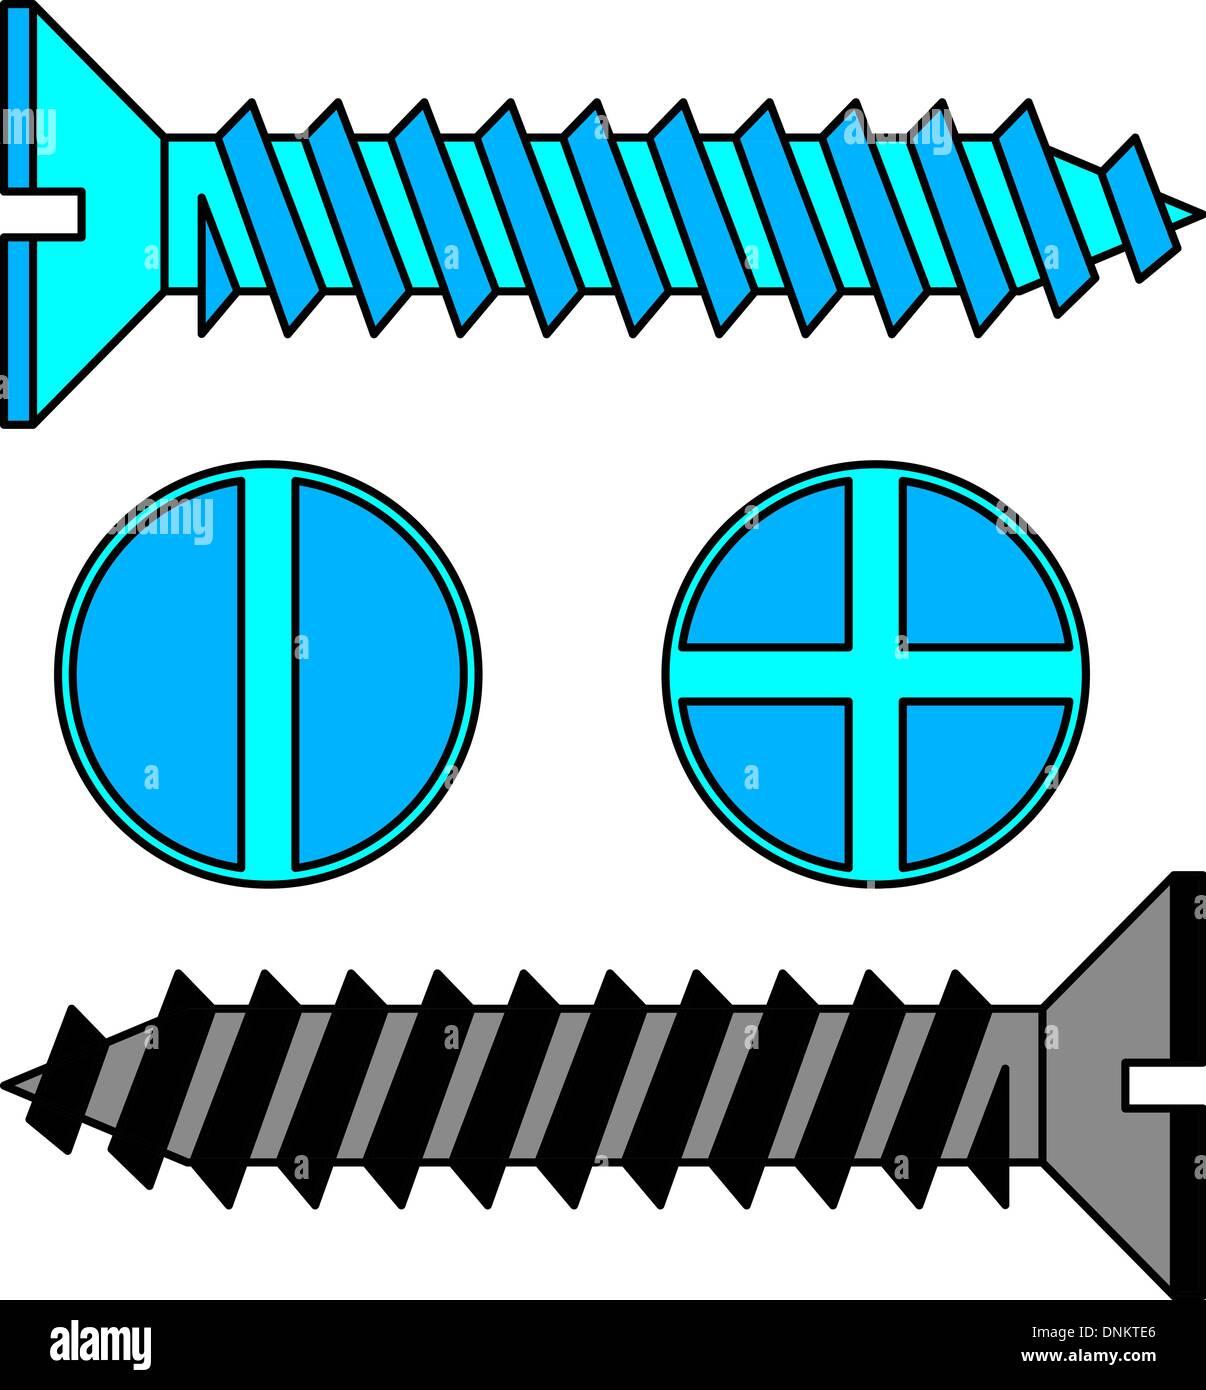 Vis en acier inoxydable. Vector illustration. Photo Stock